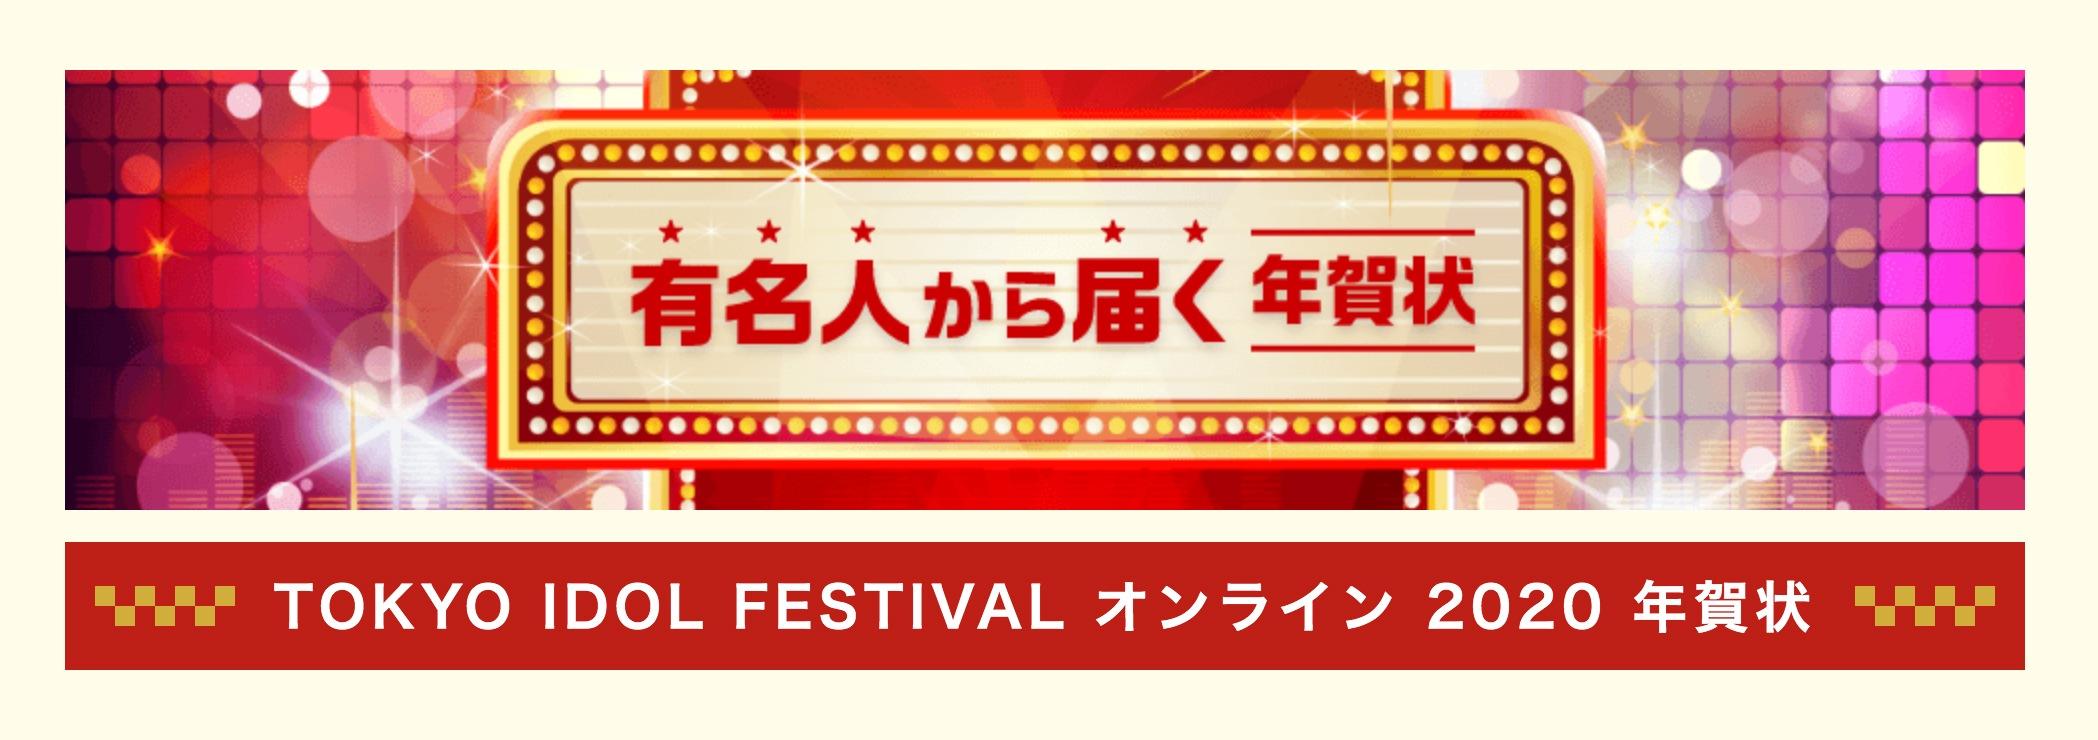 TOKYO IDOL FESTIVAL オンライン 2020 年賀状